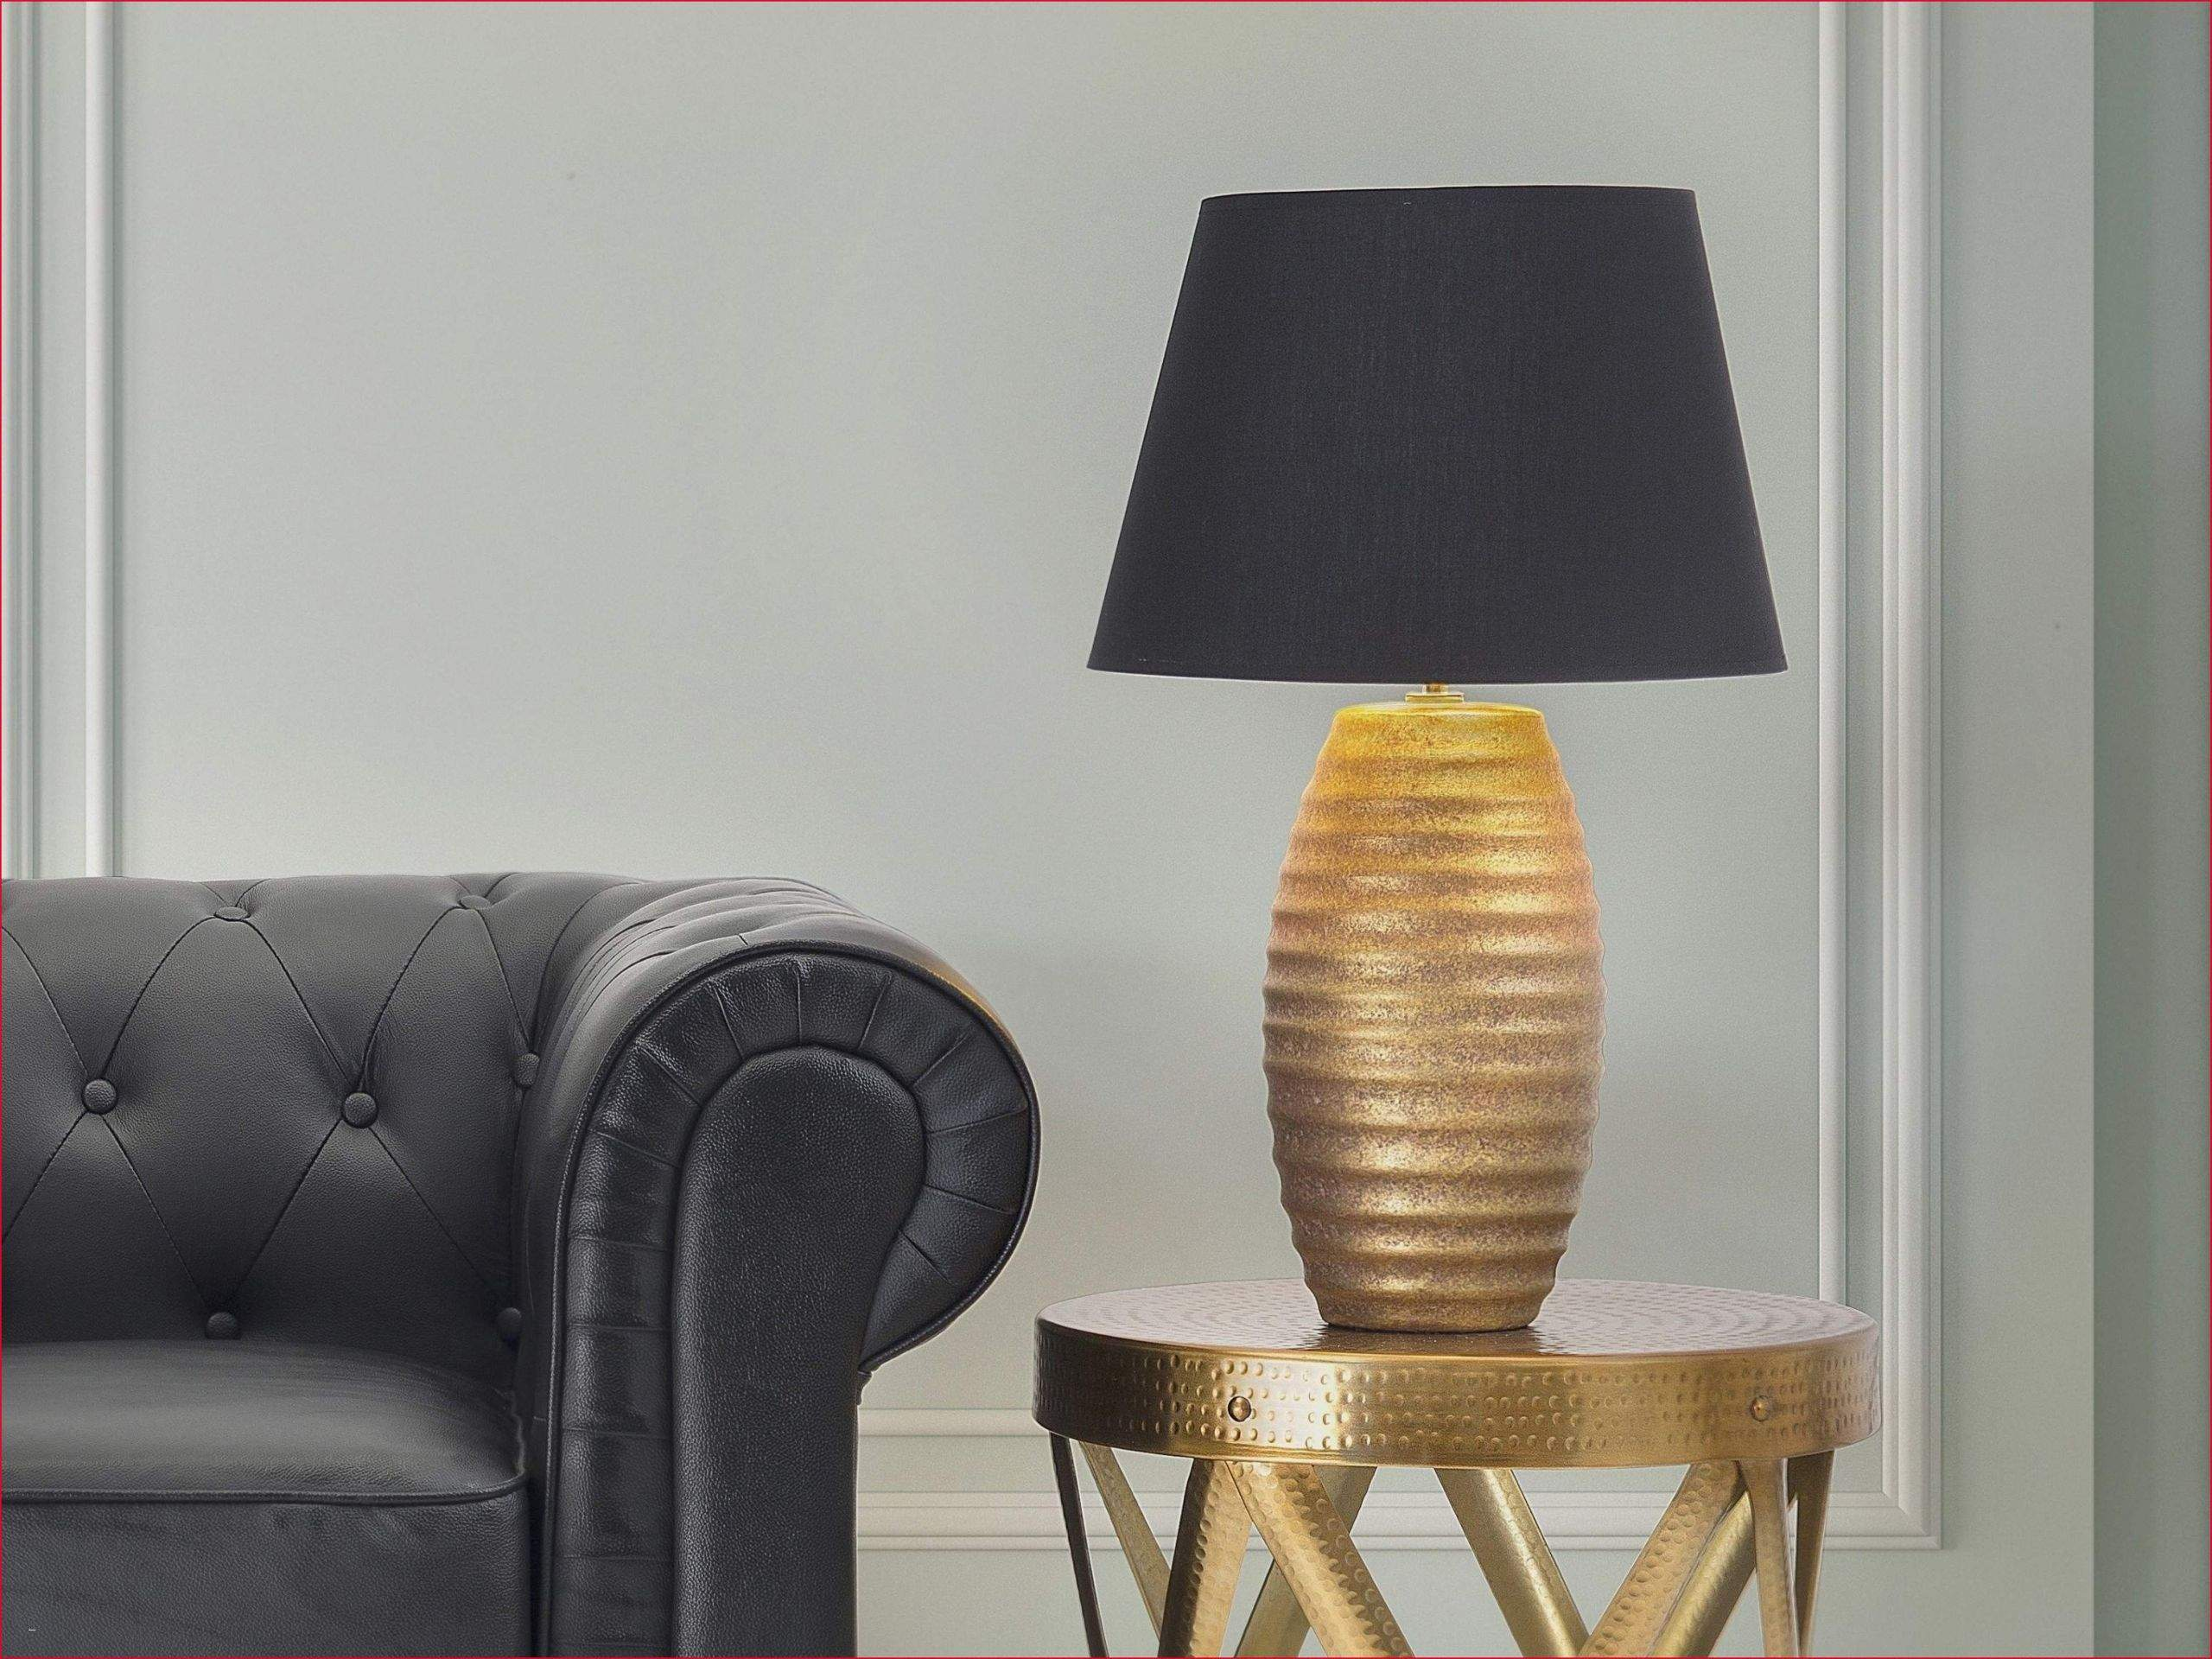 wohnzimmer lampe led elegant schon licht lampe sammlung von lampe idee lampe ideen of wohnzimmer lampe led scaled